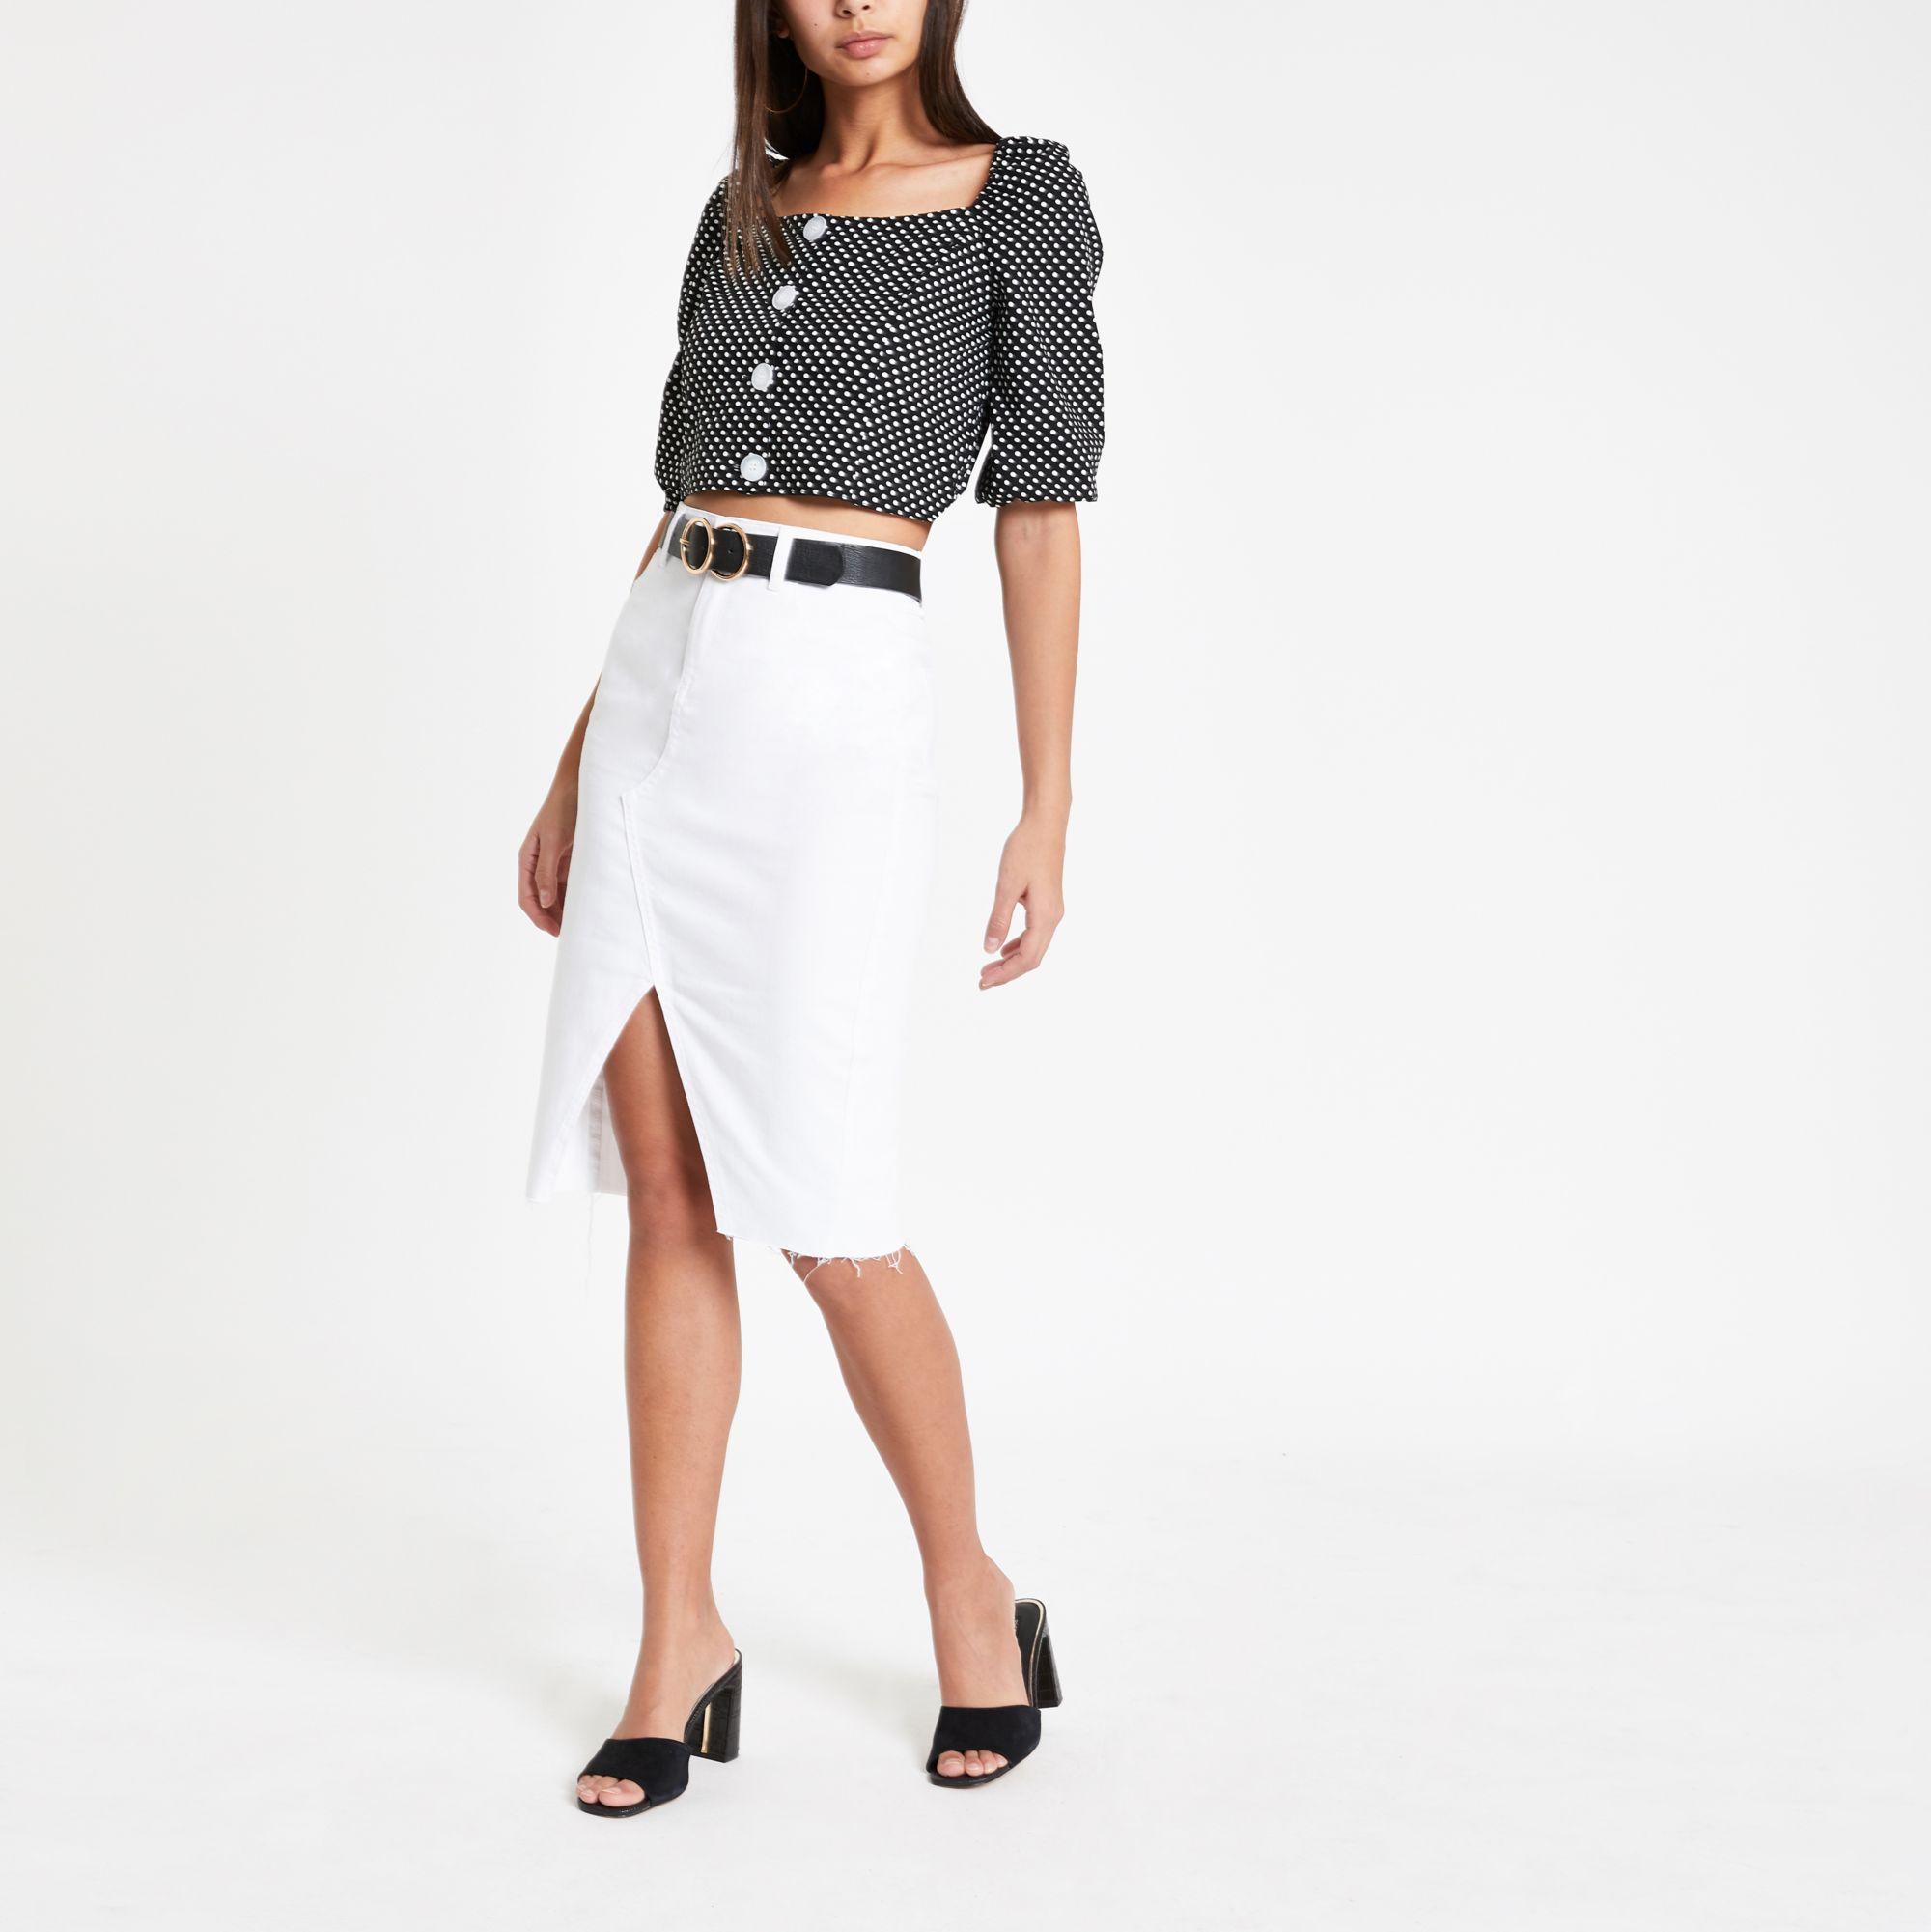 b55daea39cac1d River Island White Denim Pencil Skirt